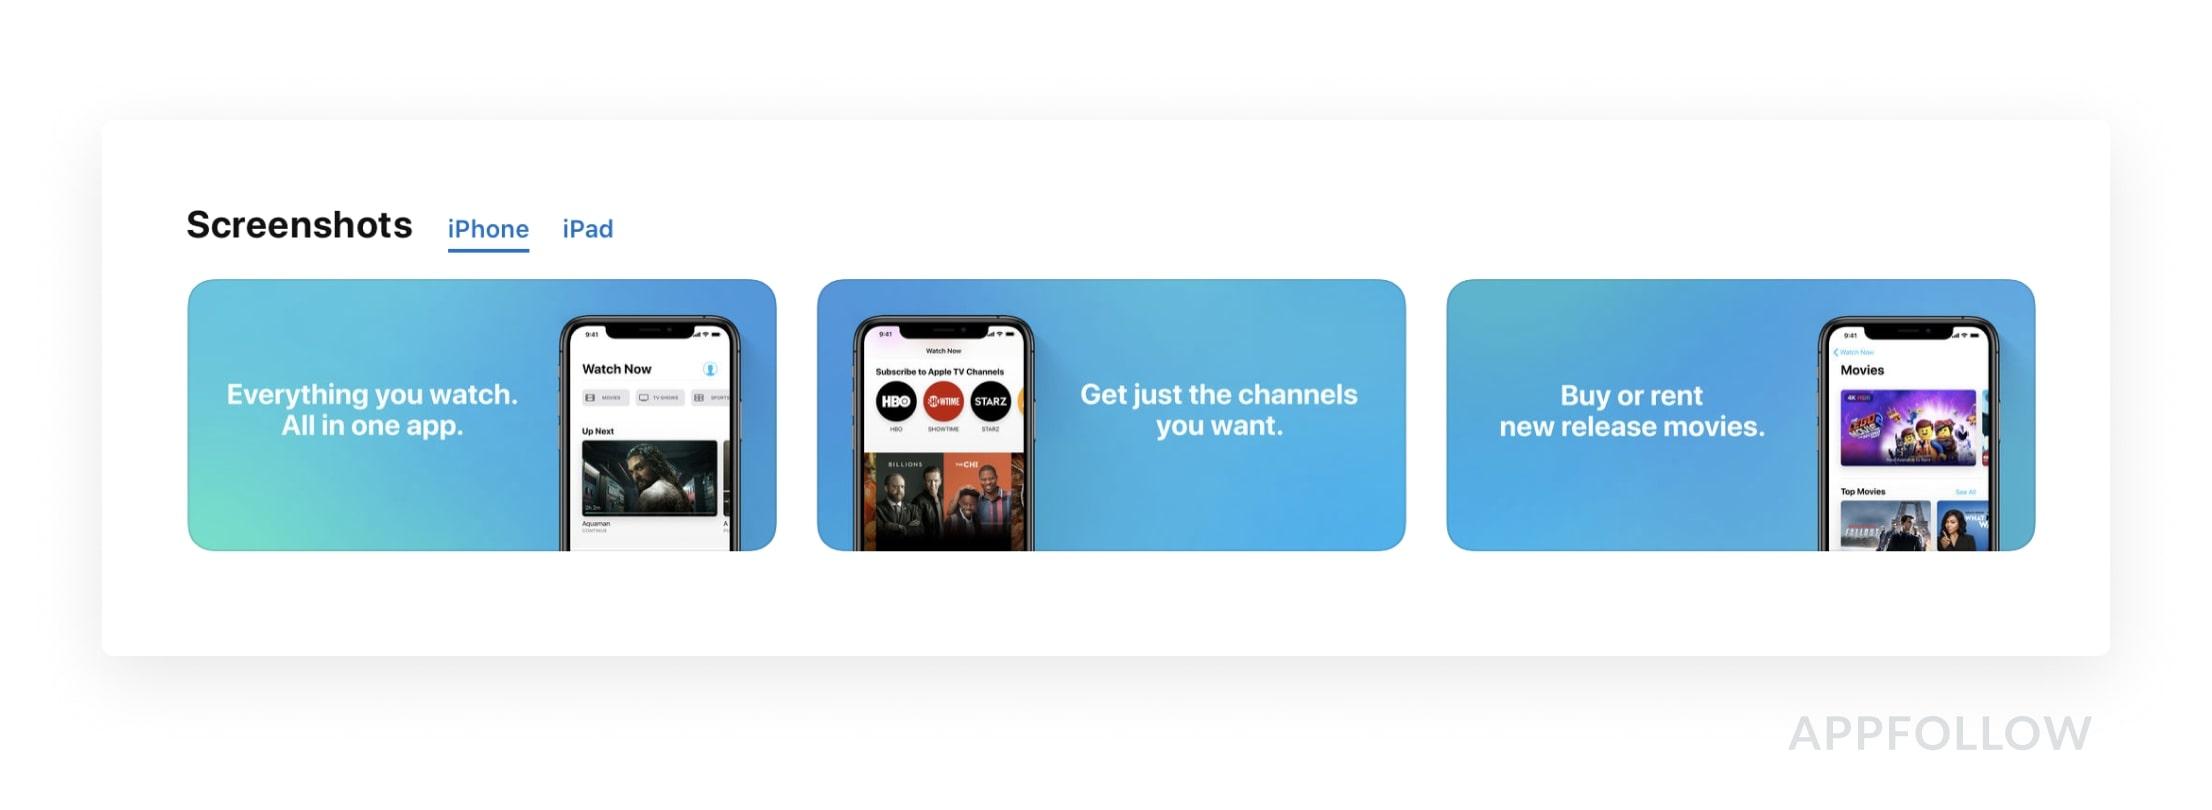 App Store AppleTV